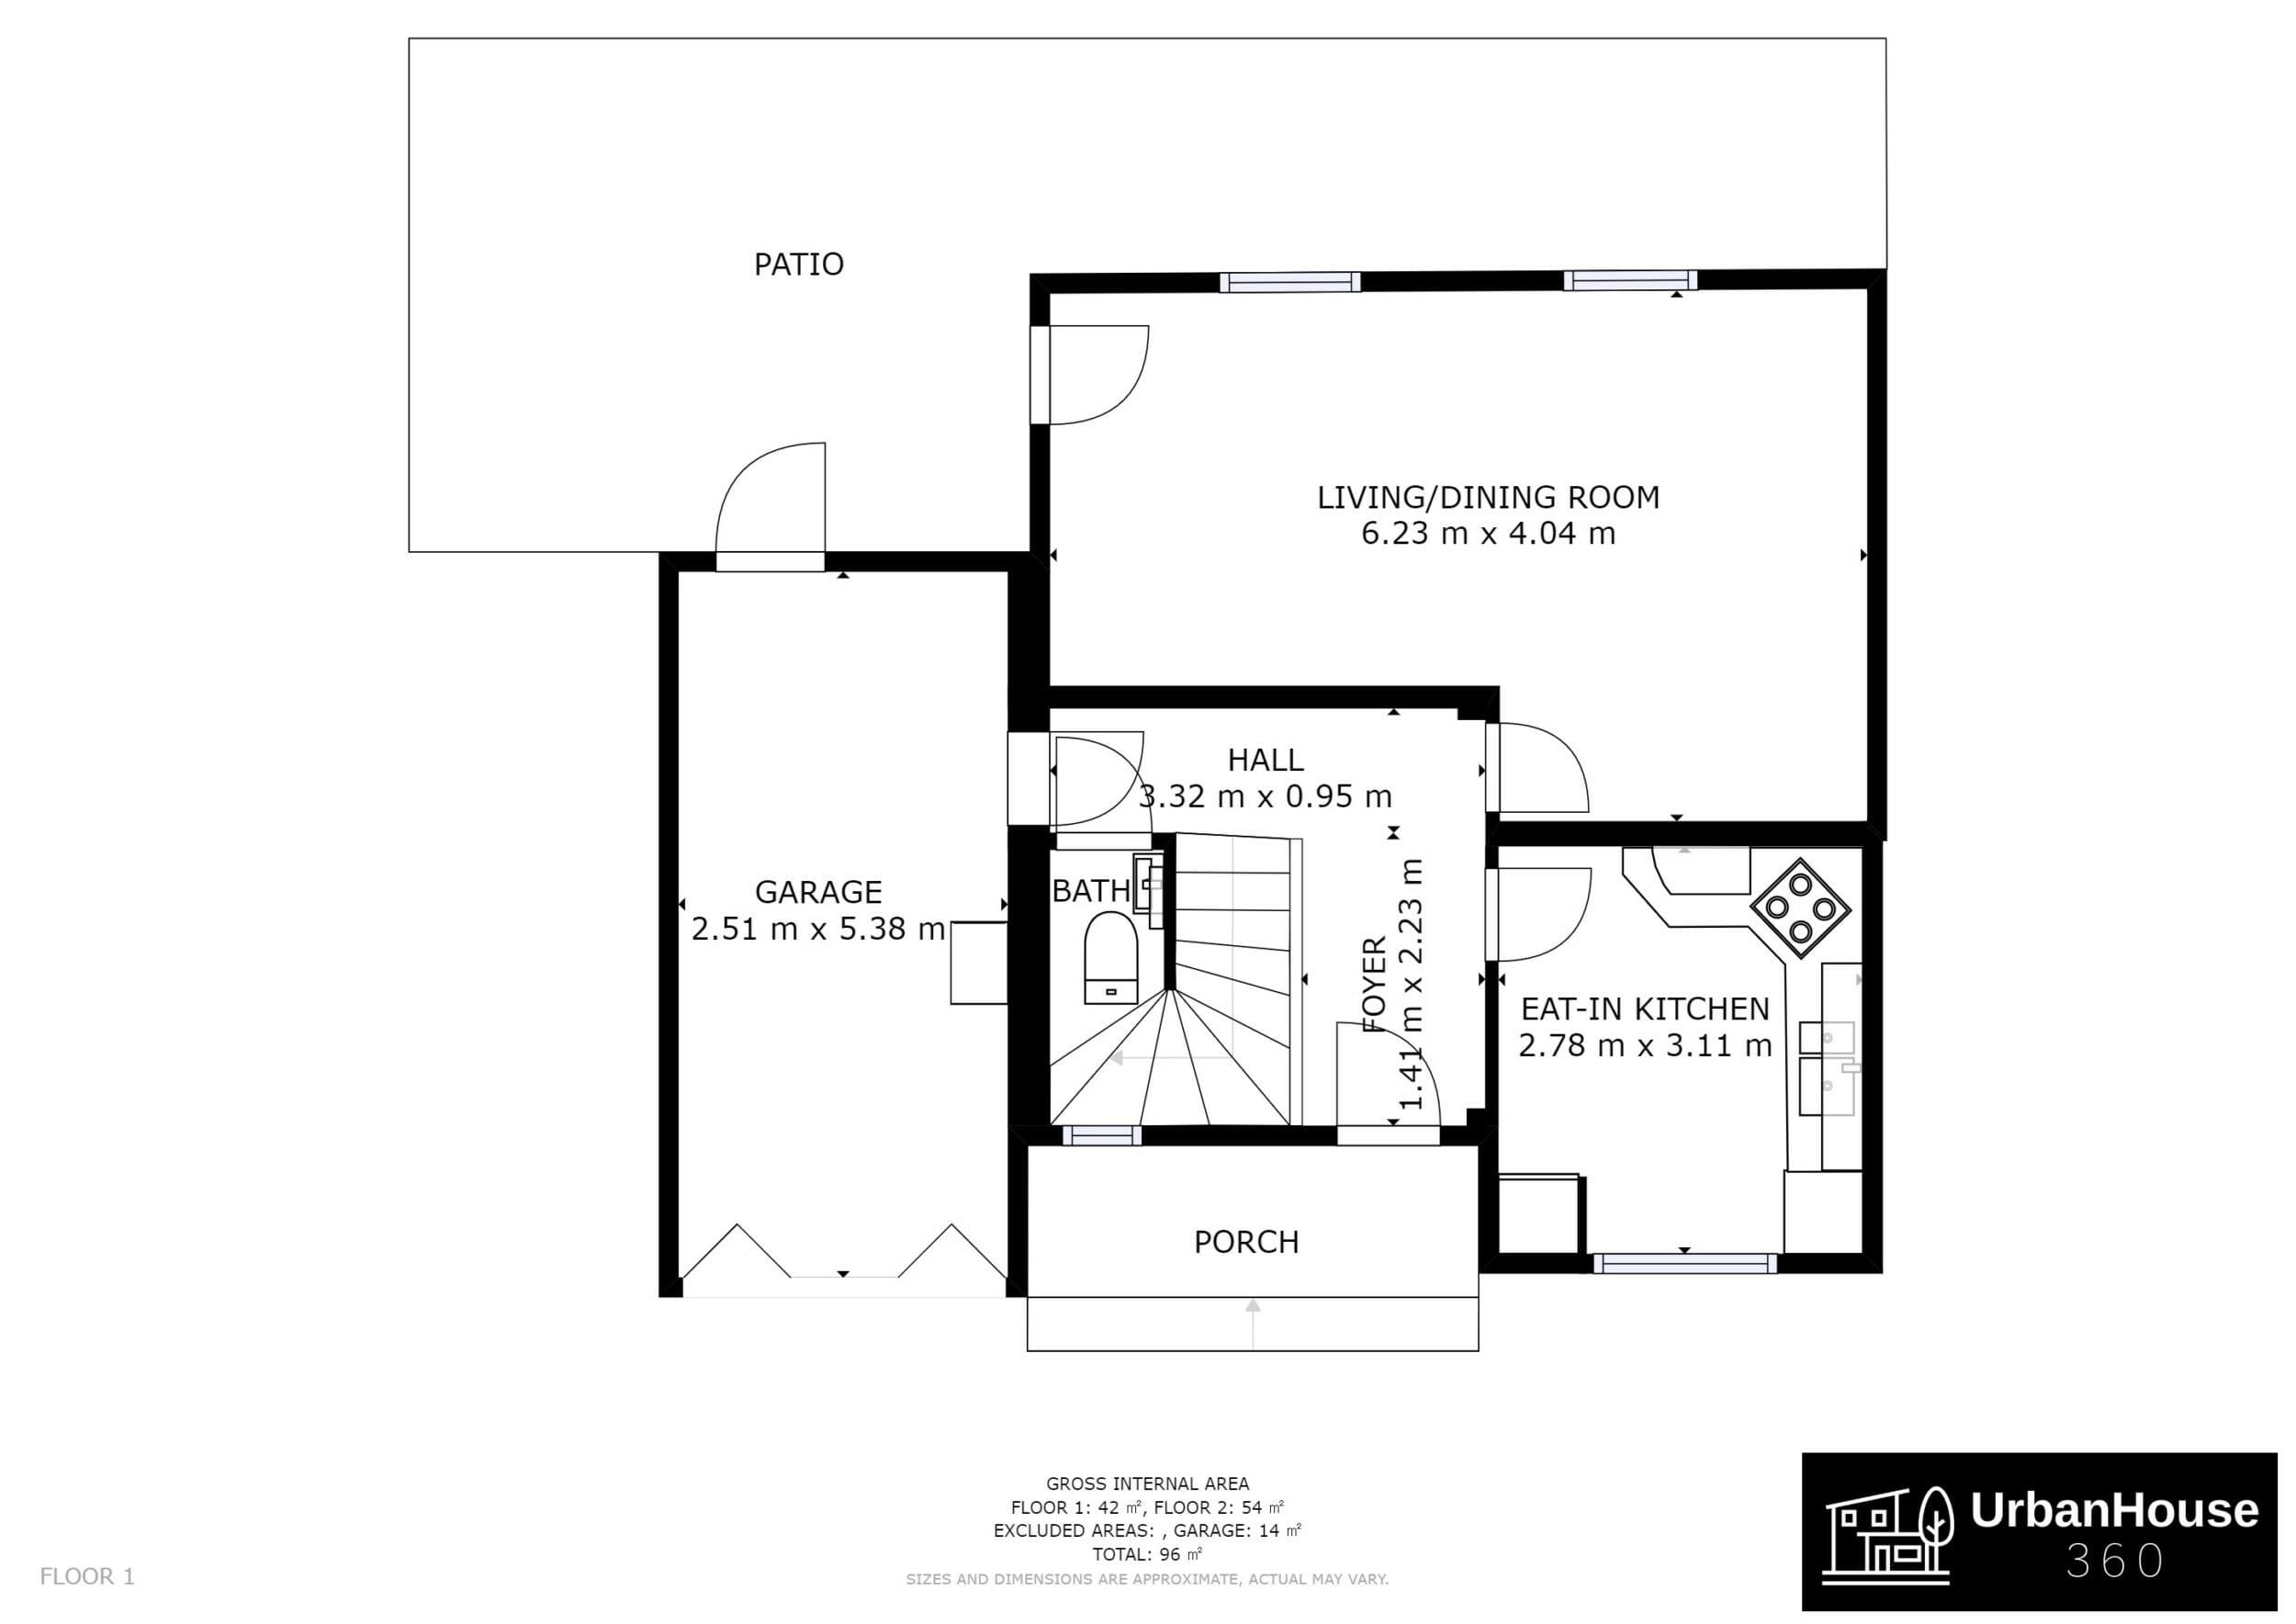 Plan2D-Atelier-Magnolia-Urbanhouse360